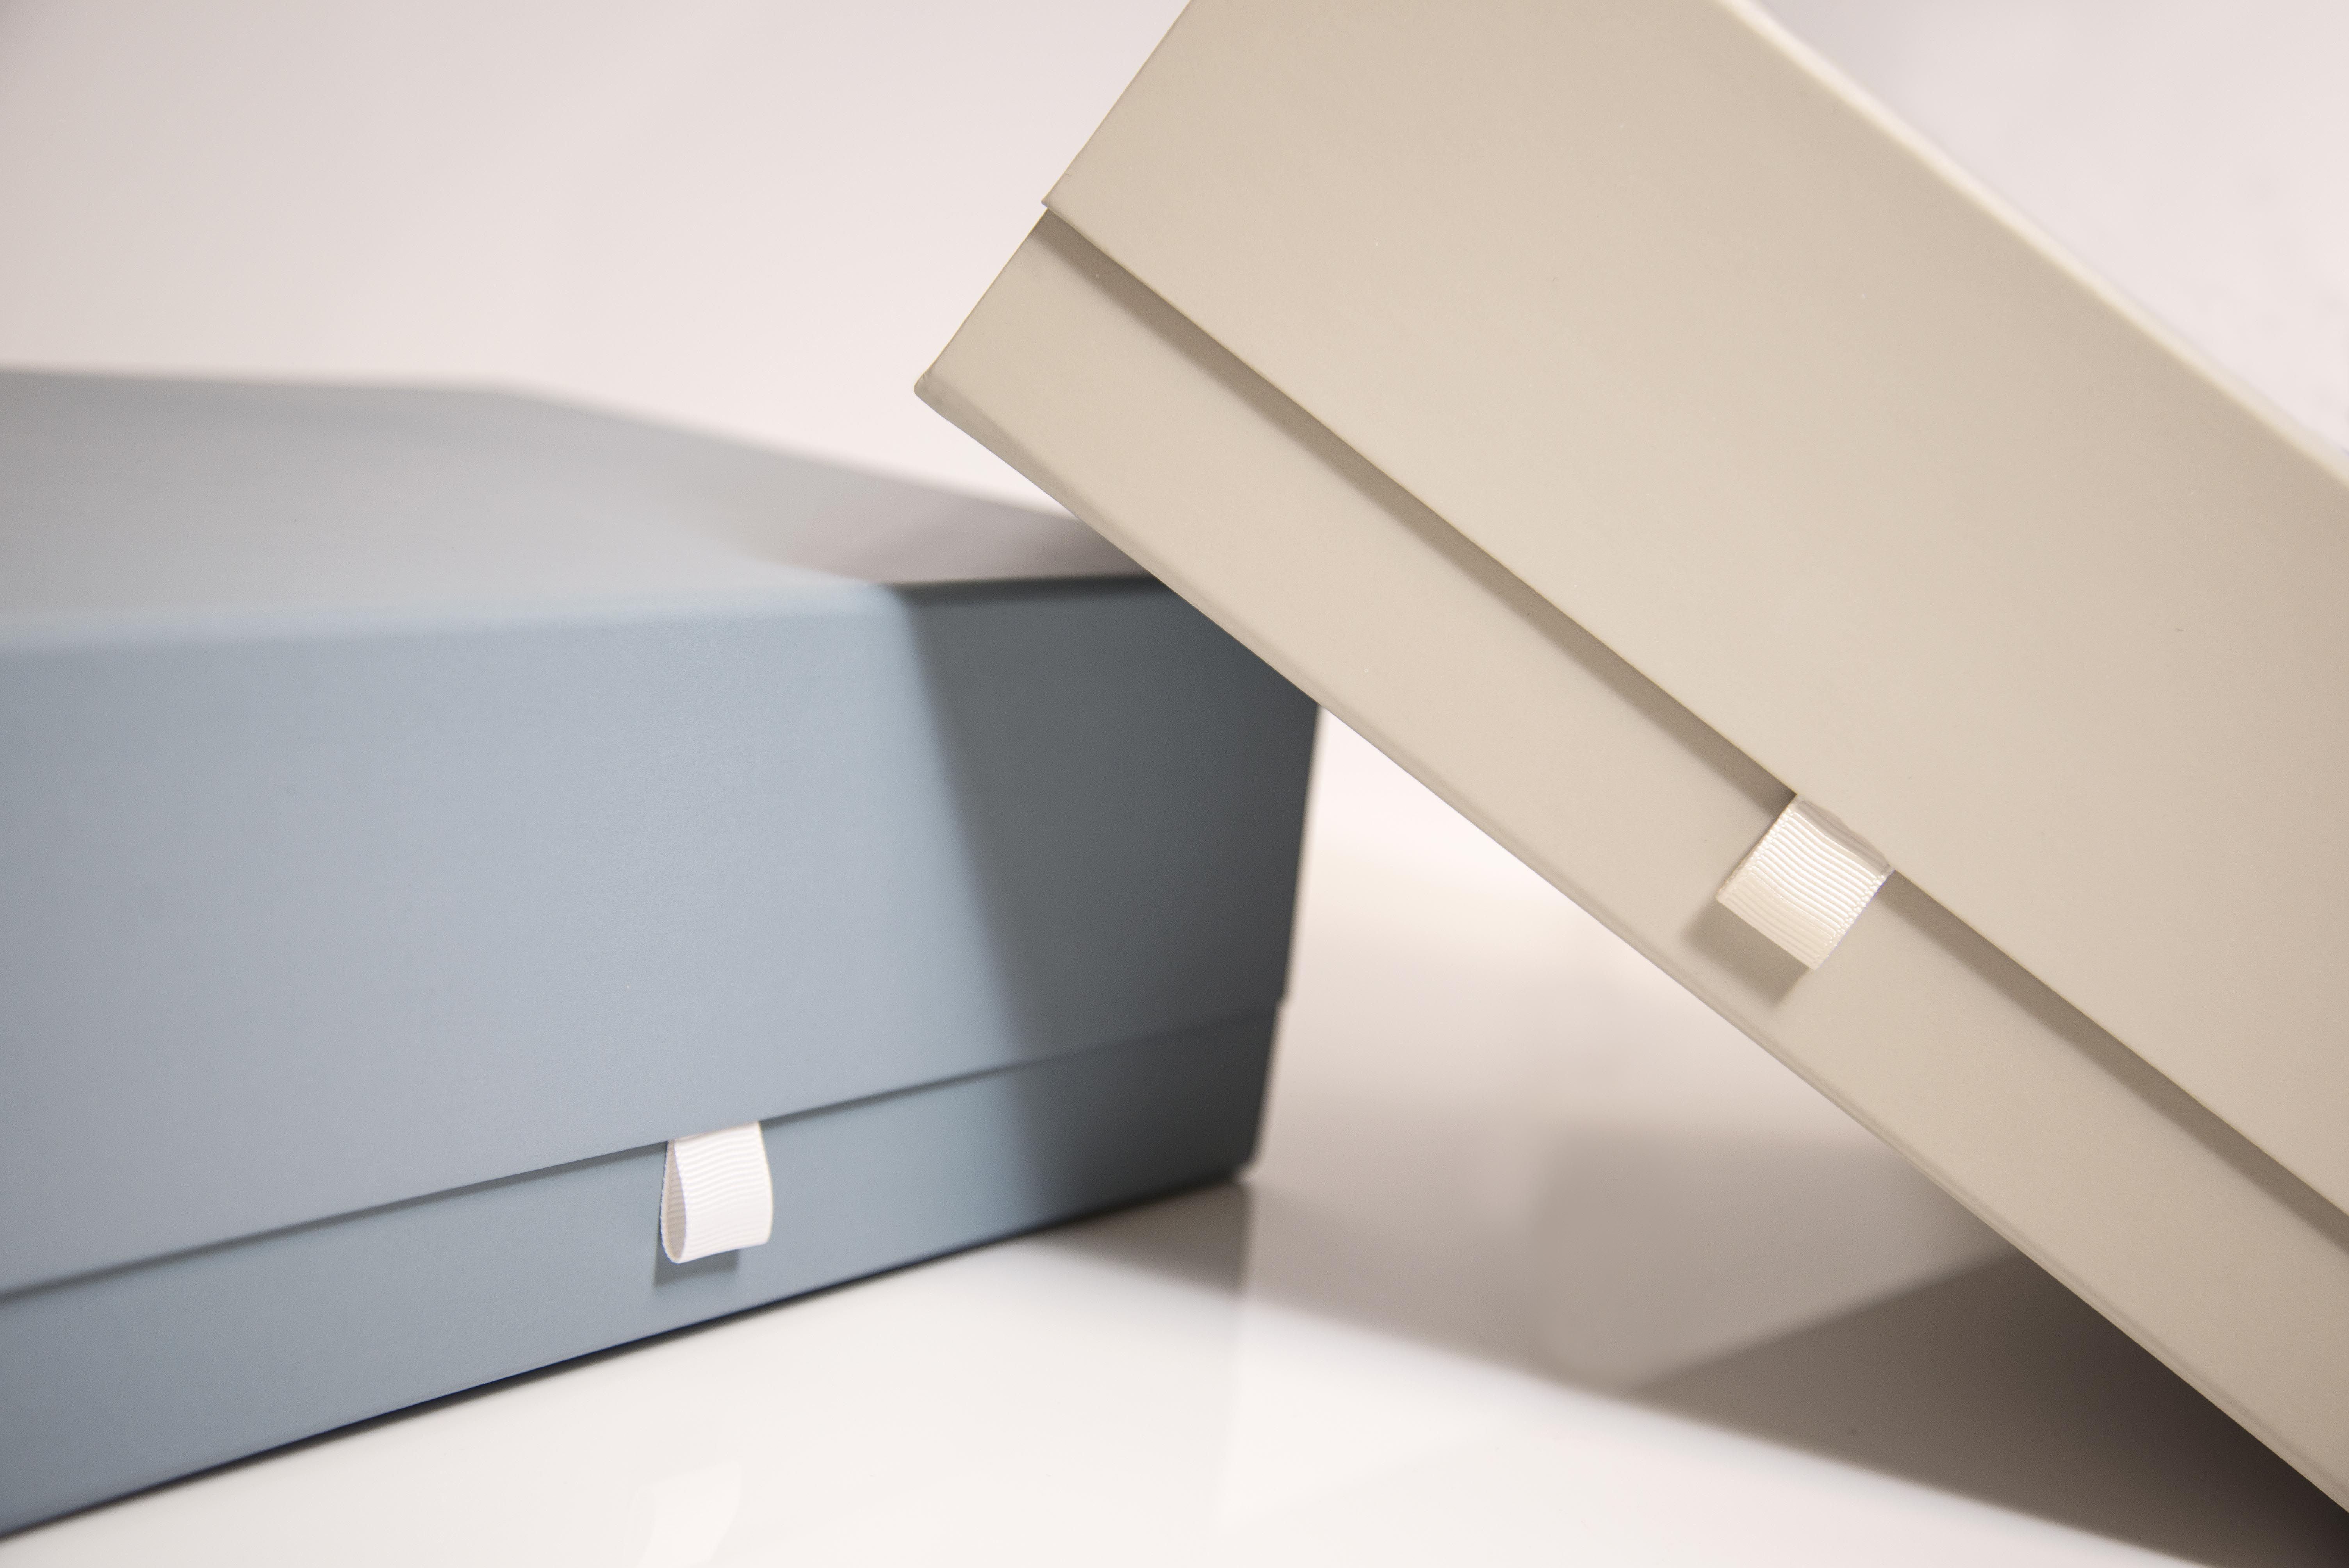 Snap shut boxes with ribbon tabsnap shut boxes gift boxes box snap shut boxes with ribbon negle Choice Image